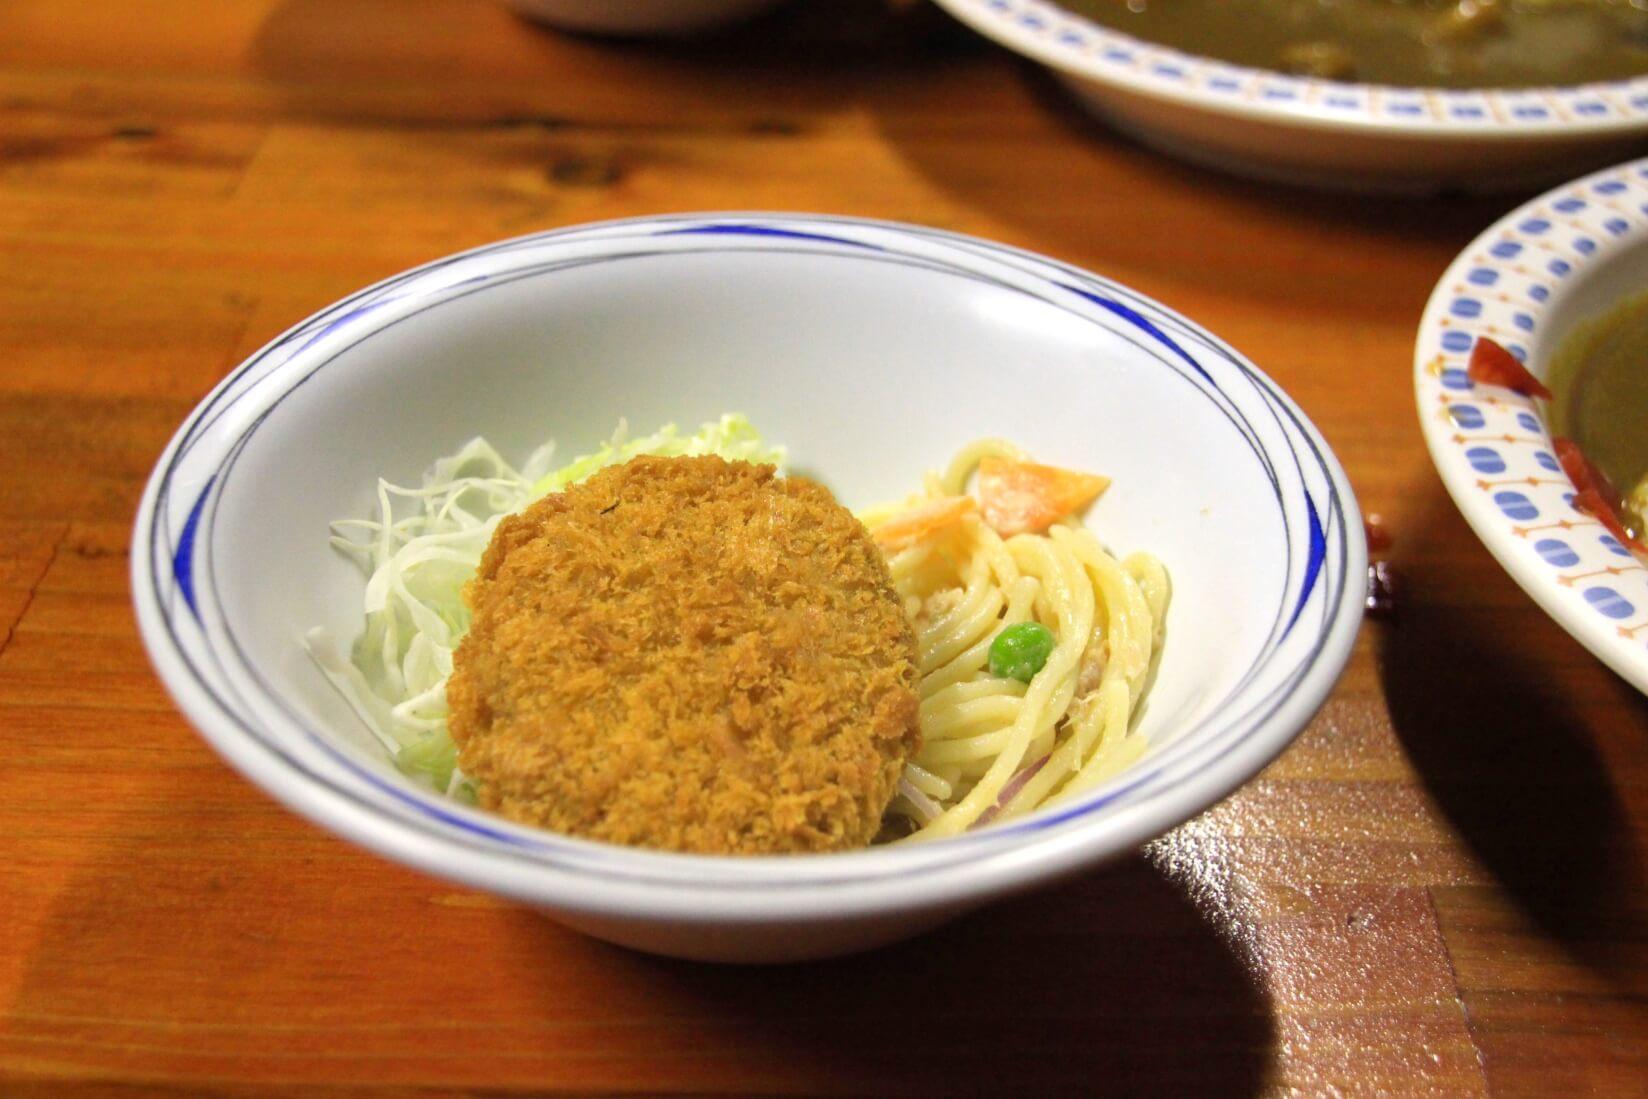 阿曽原温泉小屋の夕食